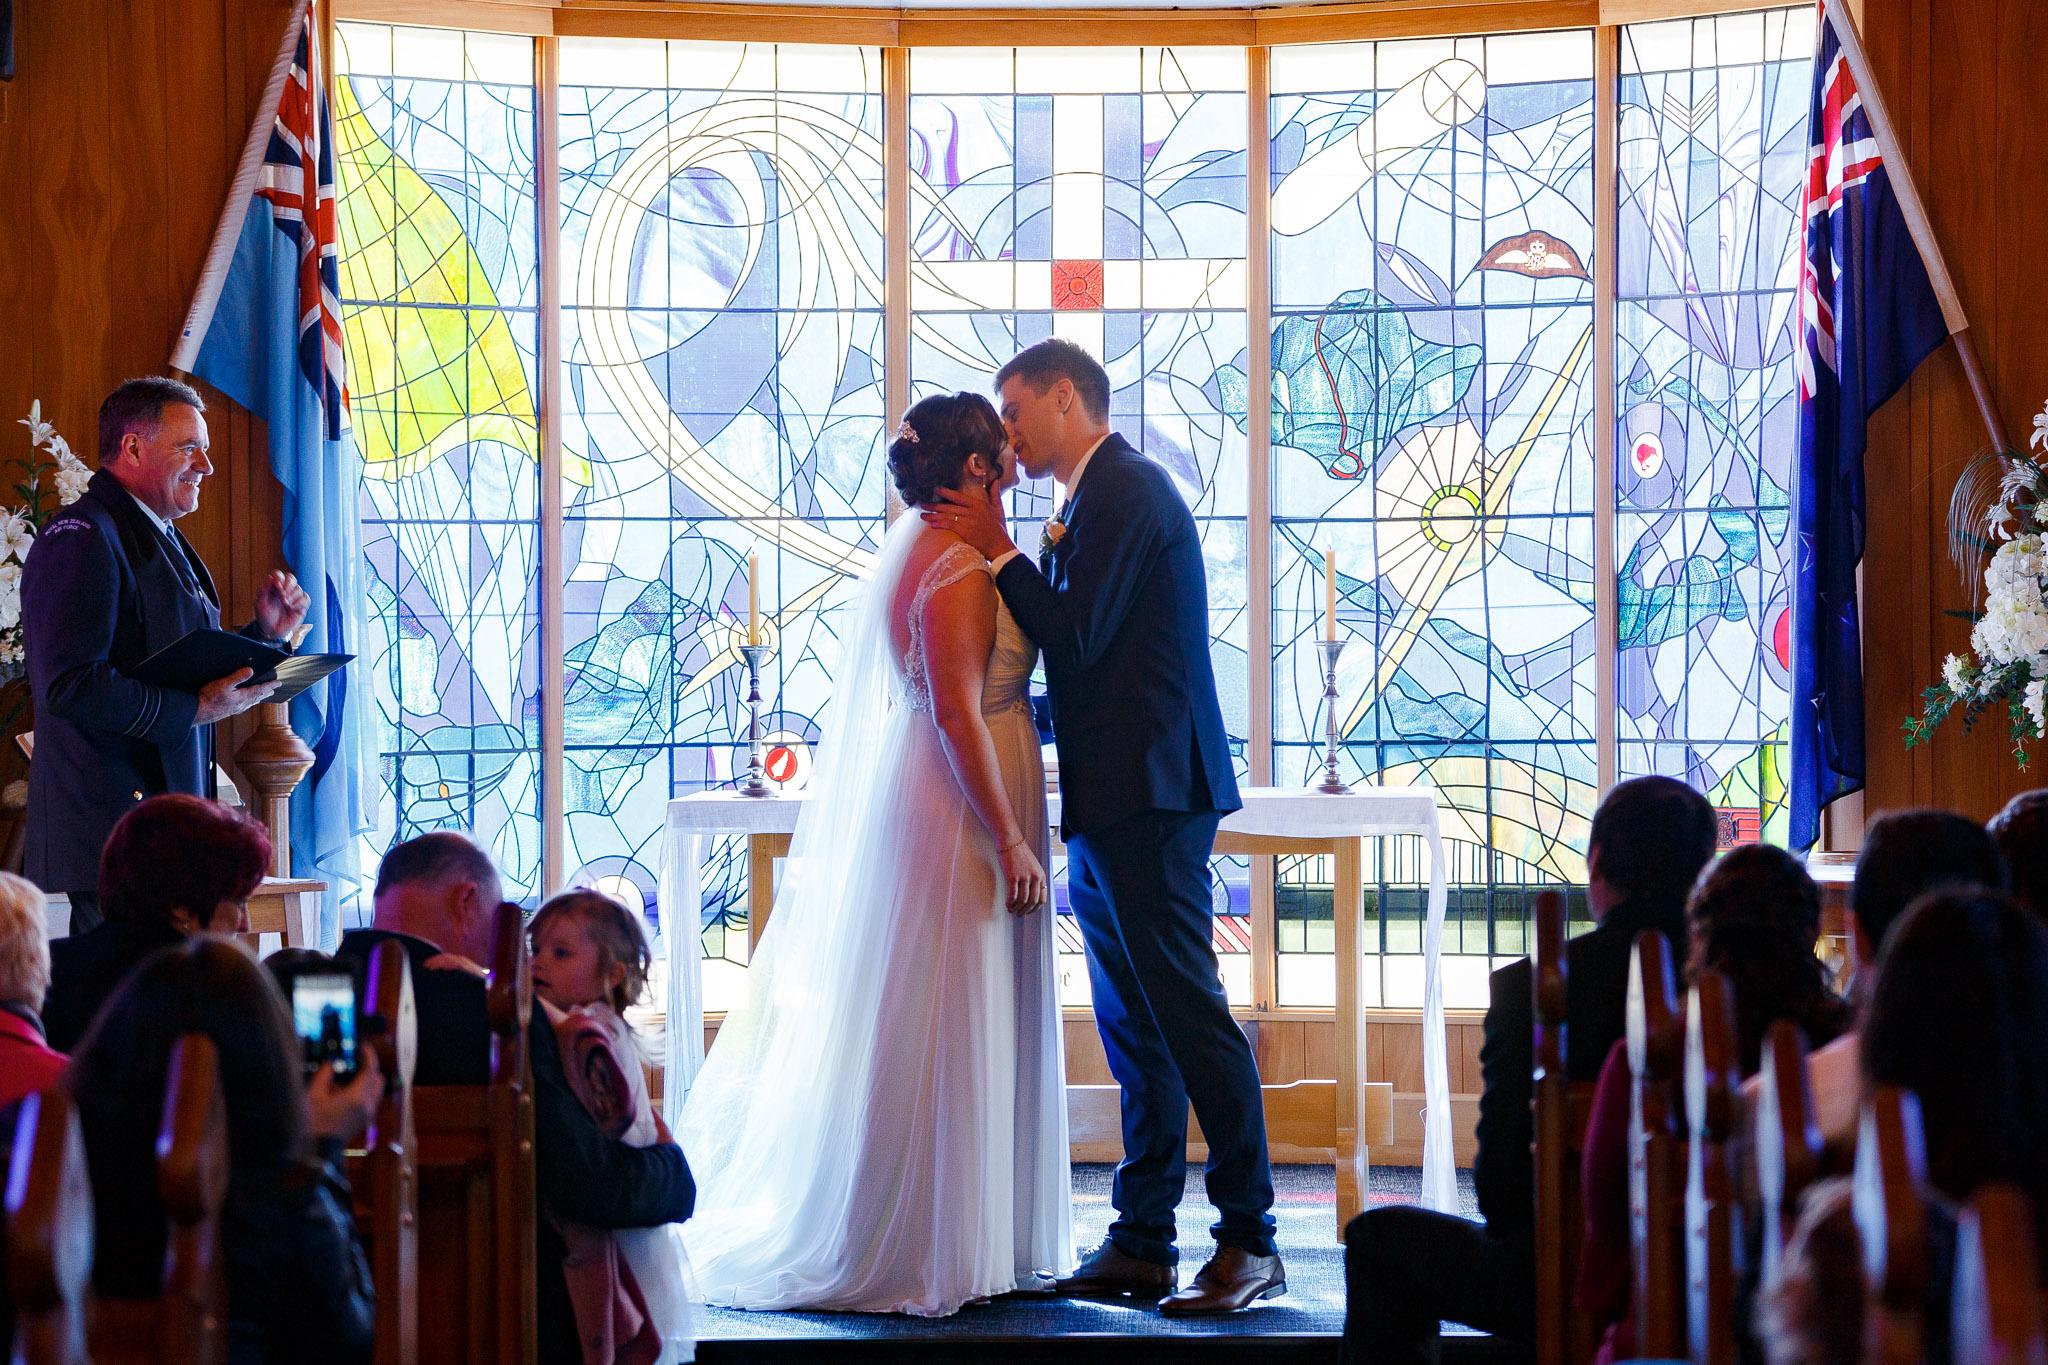 highlight_wedding_photography_manawatu_palmerston_north_new_zealand_rangitikei_golf_ohakea-23.jpg